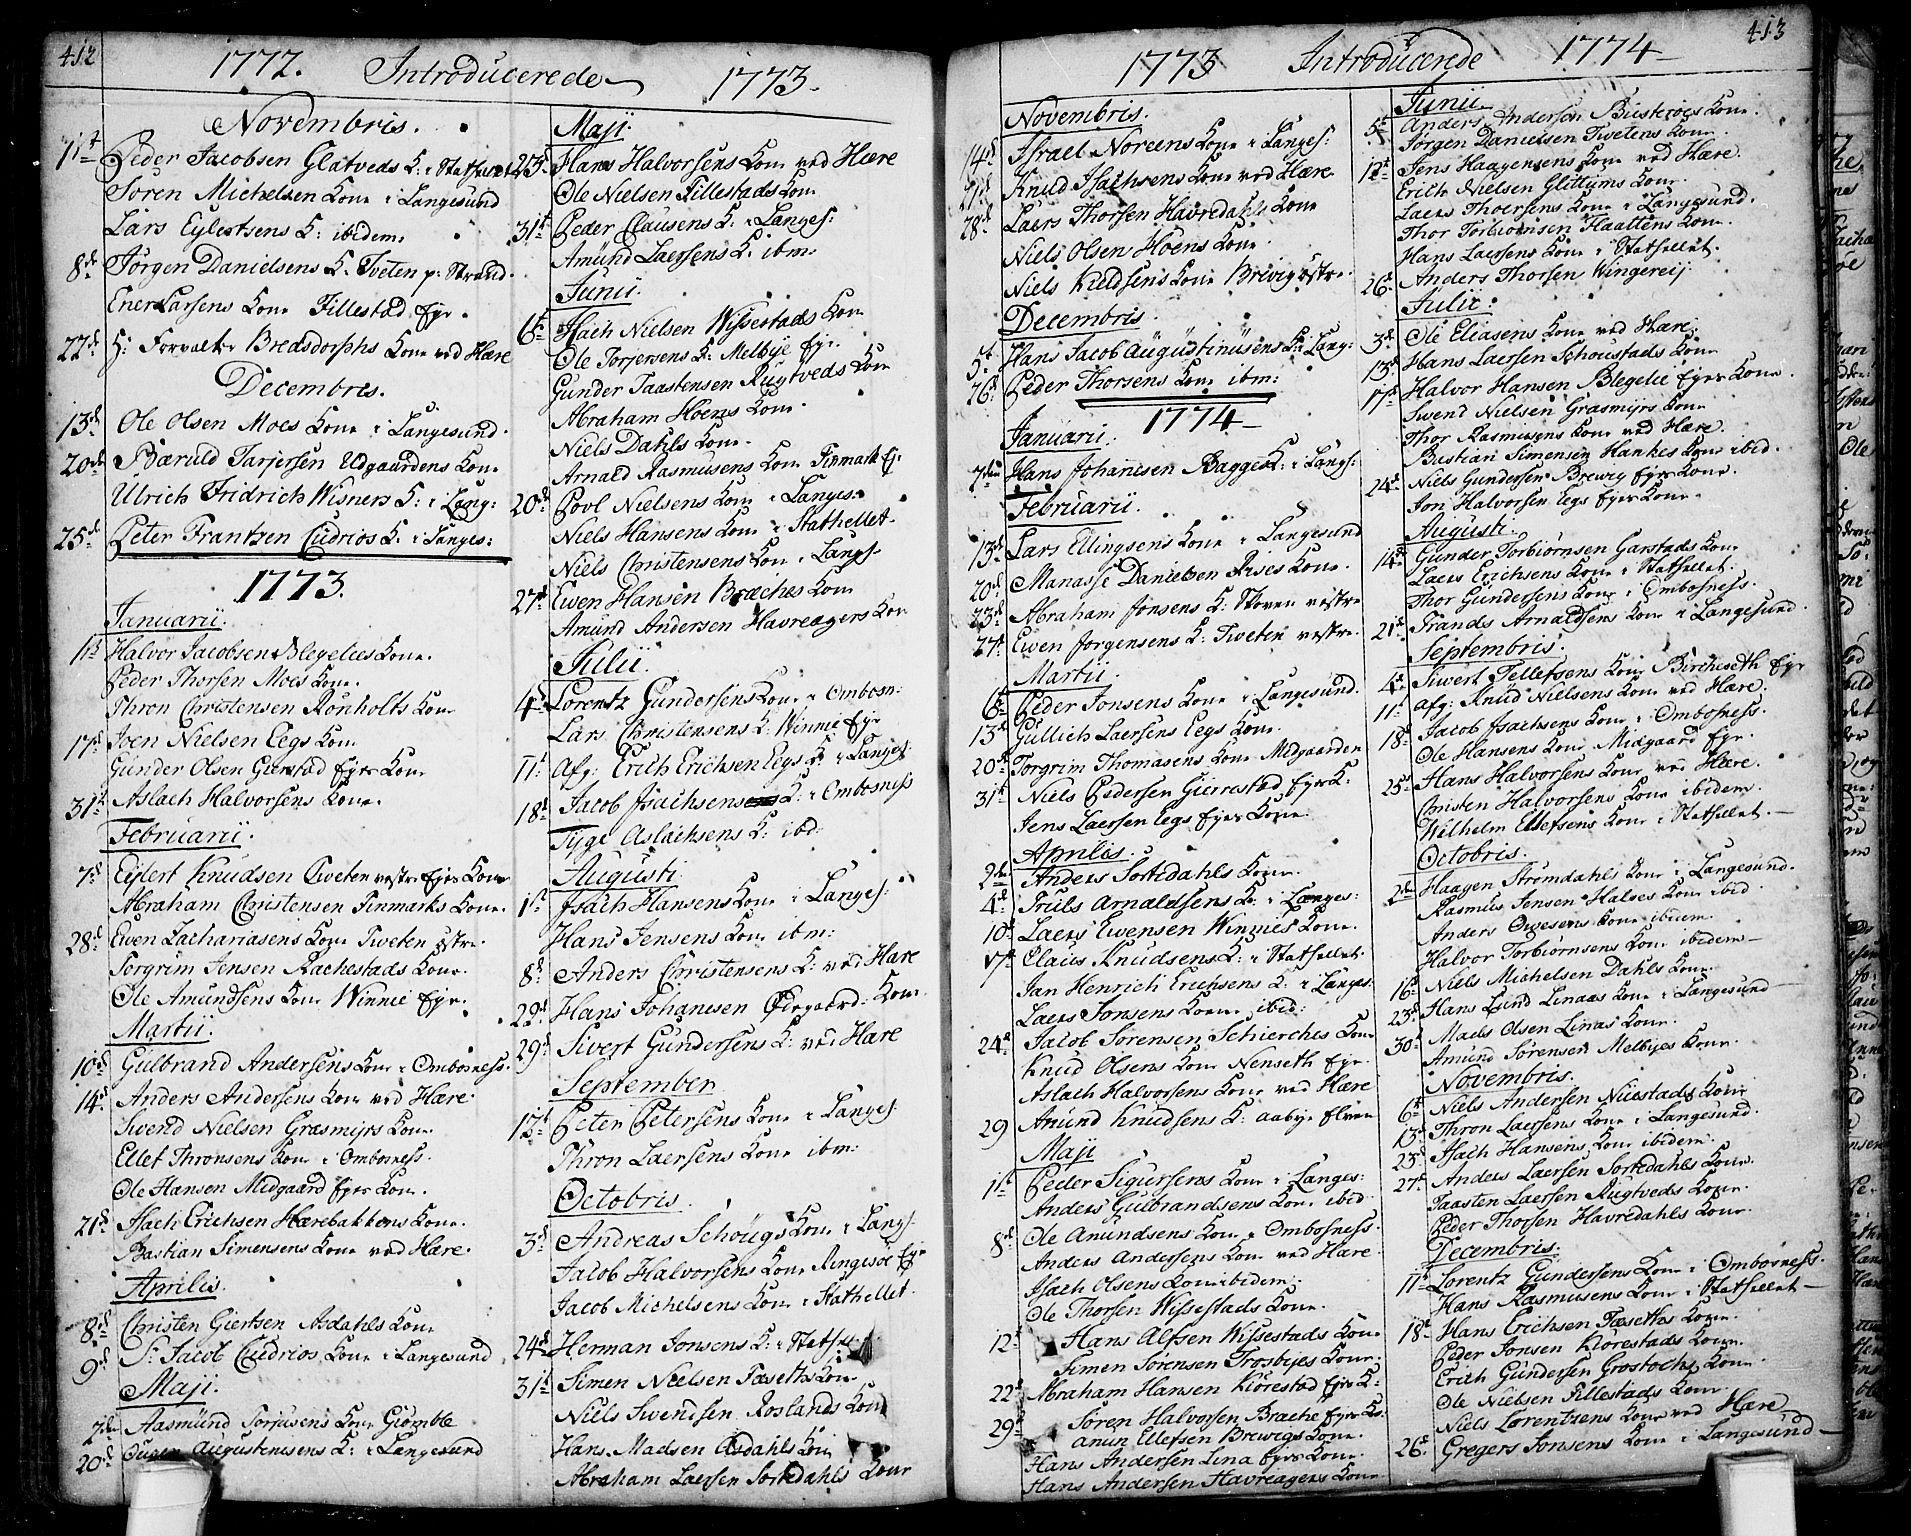 SAKO, Bamble kirkebøker, F/Fa/L0001: Ministerialbok nr. I 1, 1702-1774, s. 412-413